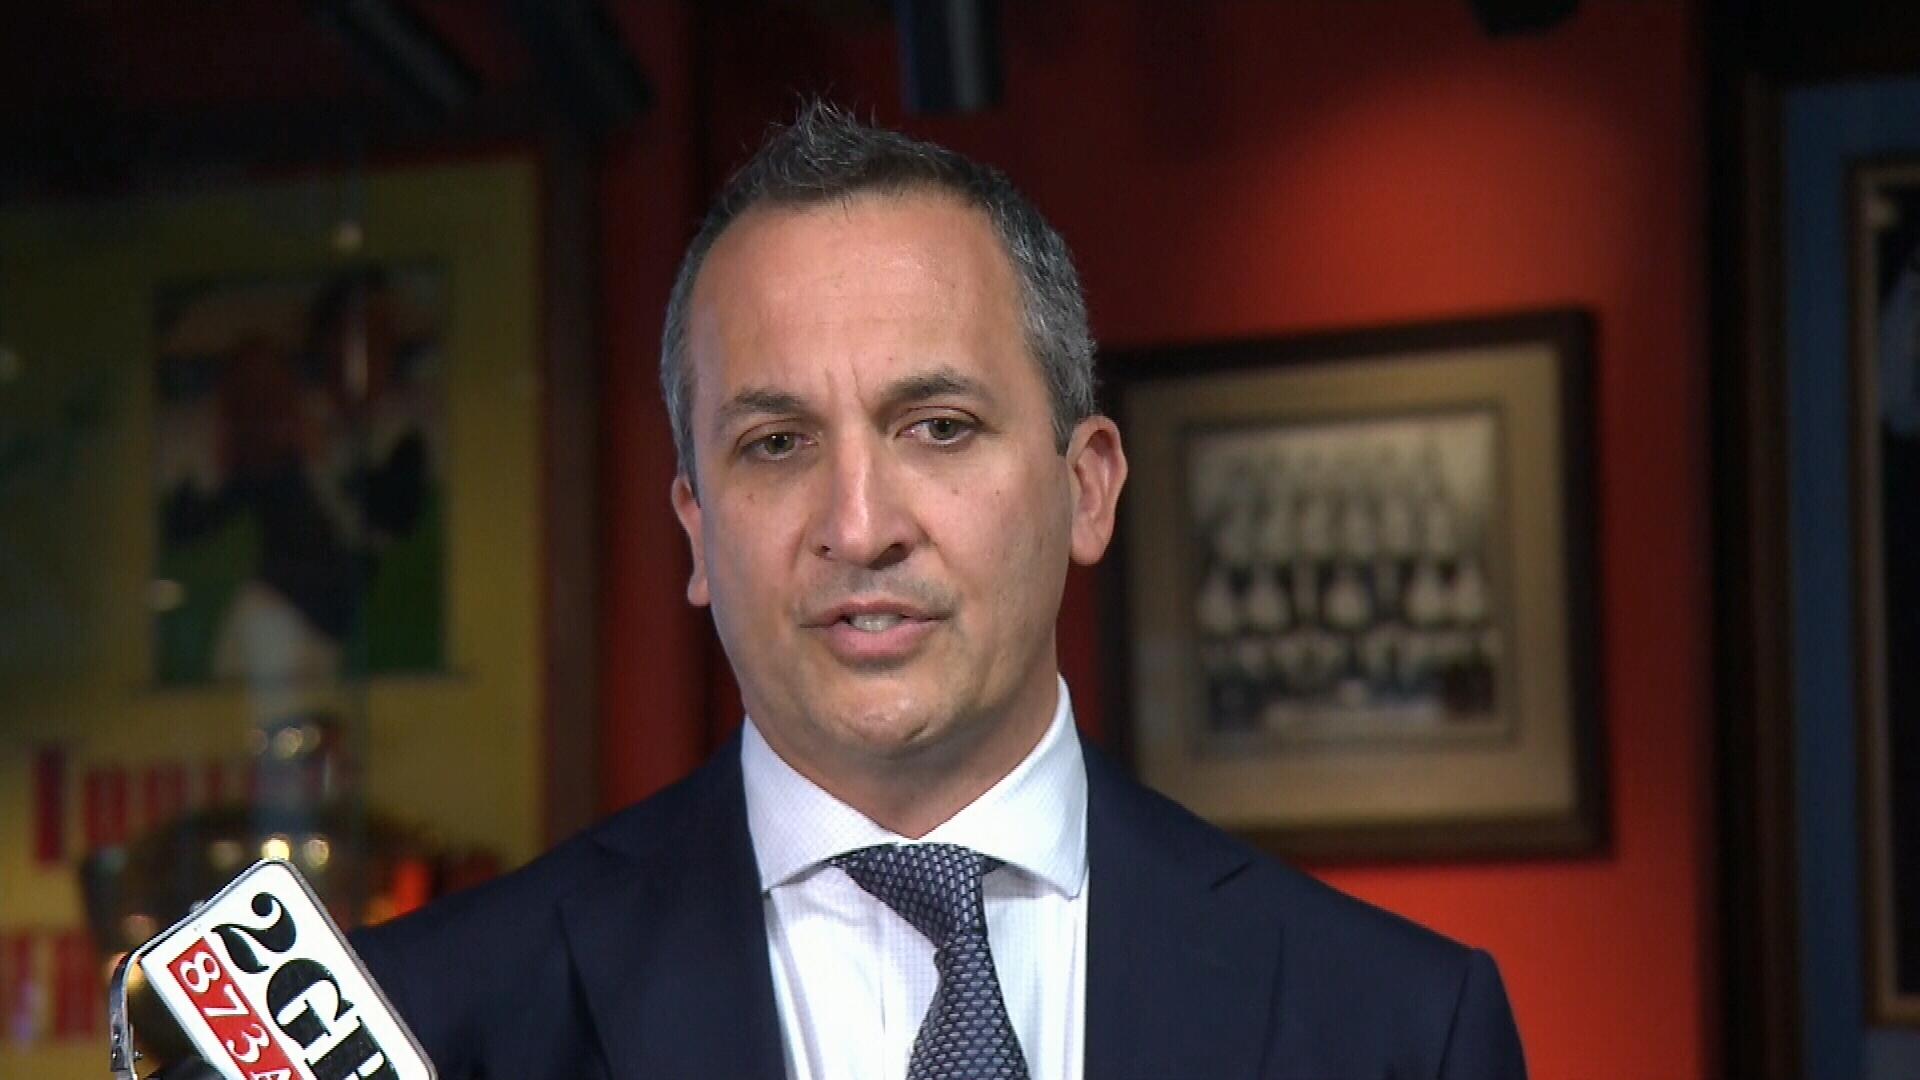 NRL CEO Andrew Abdo